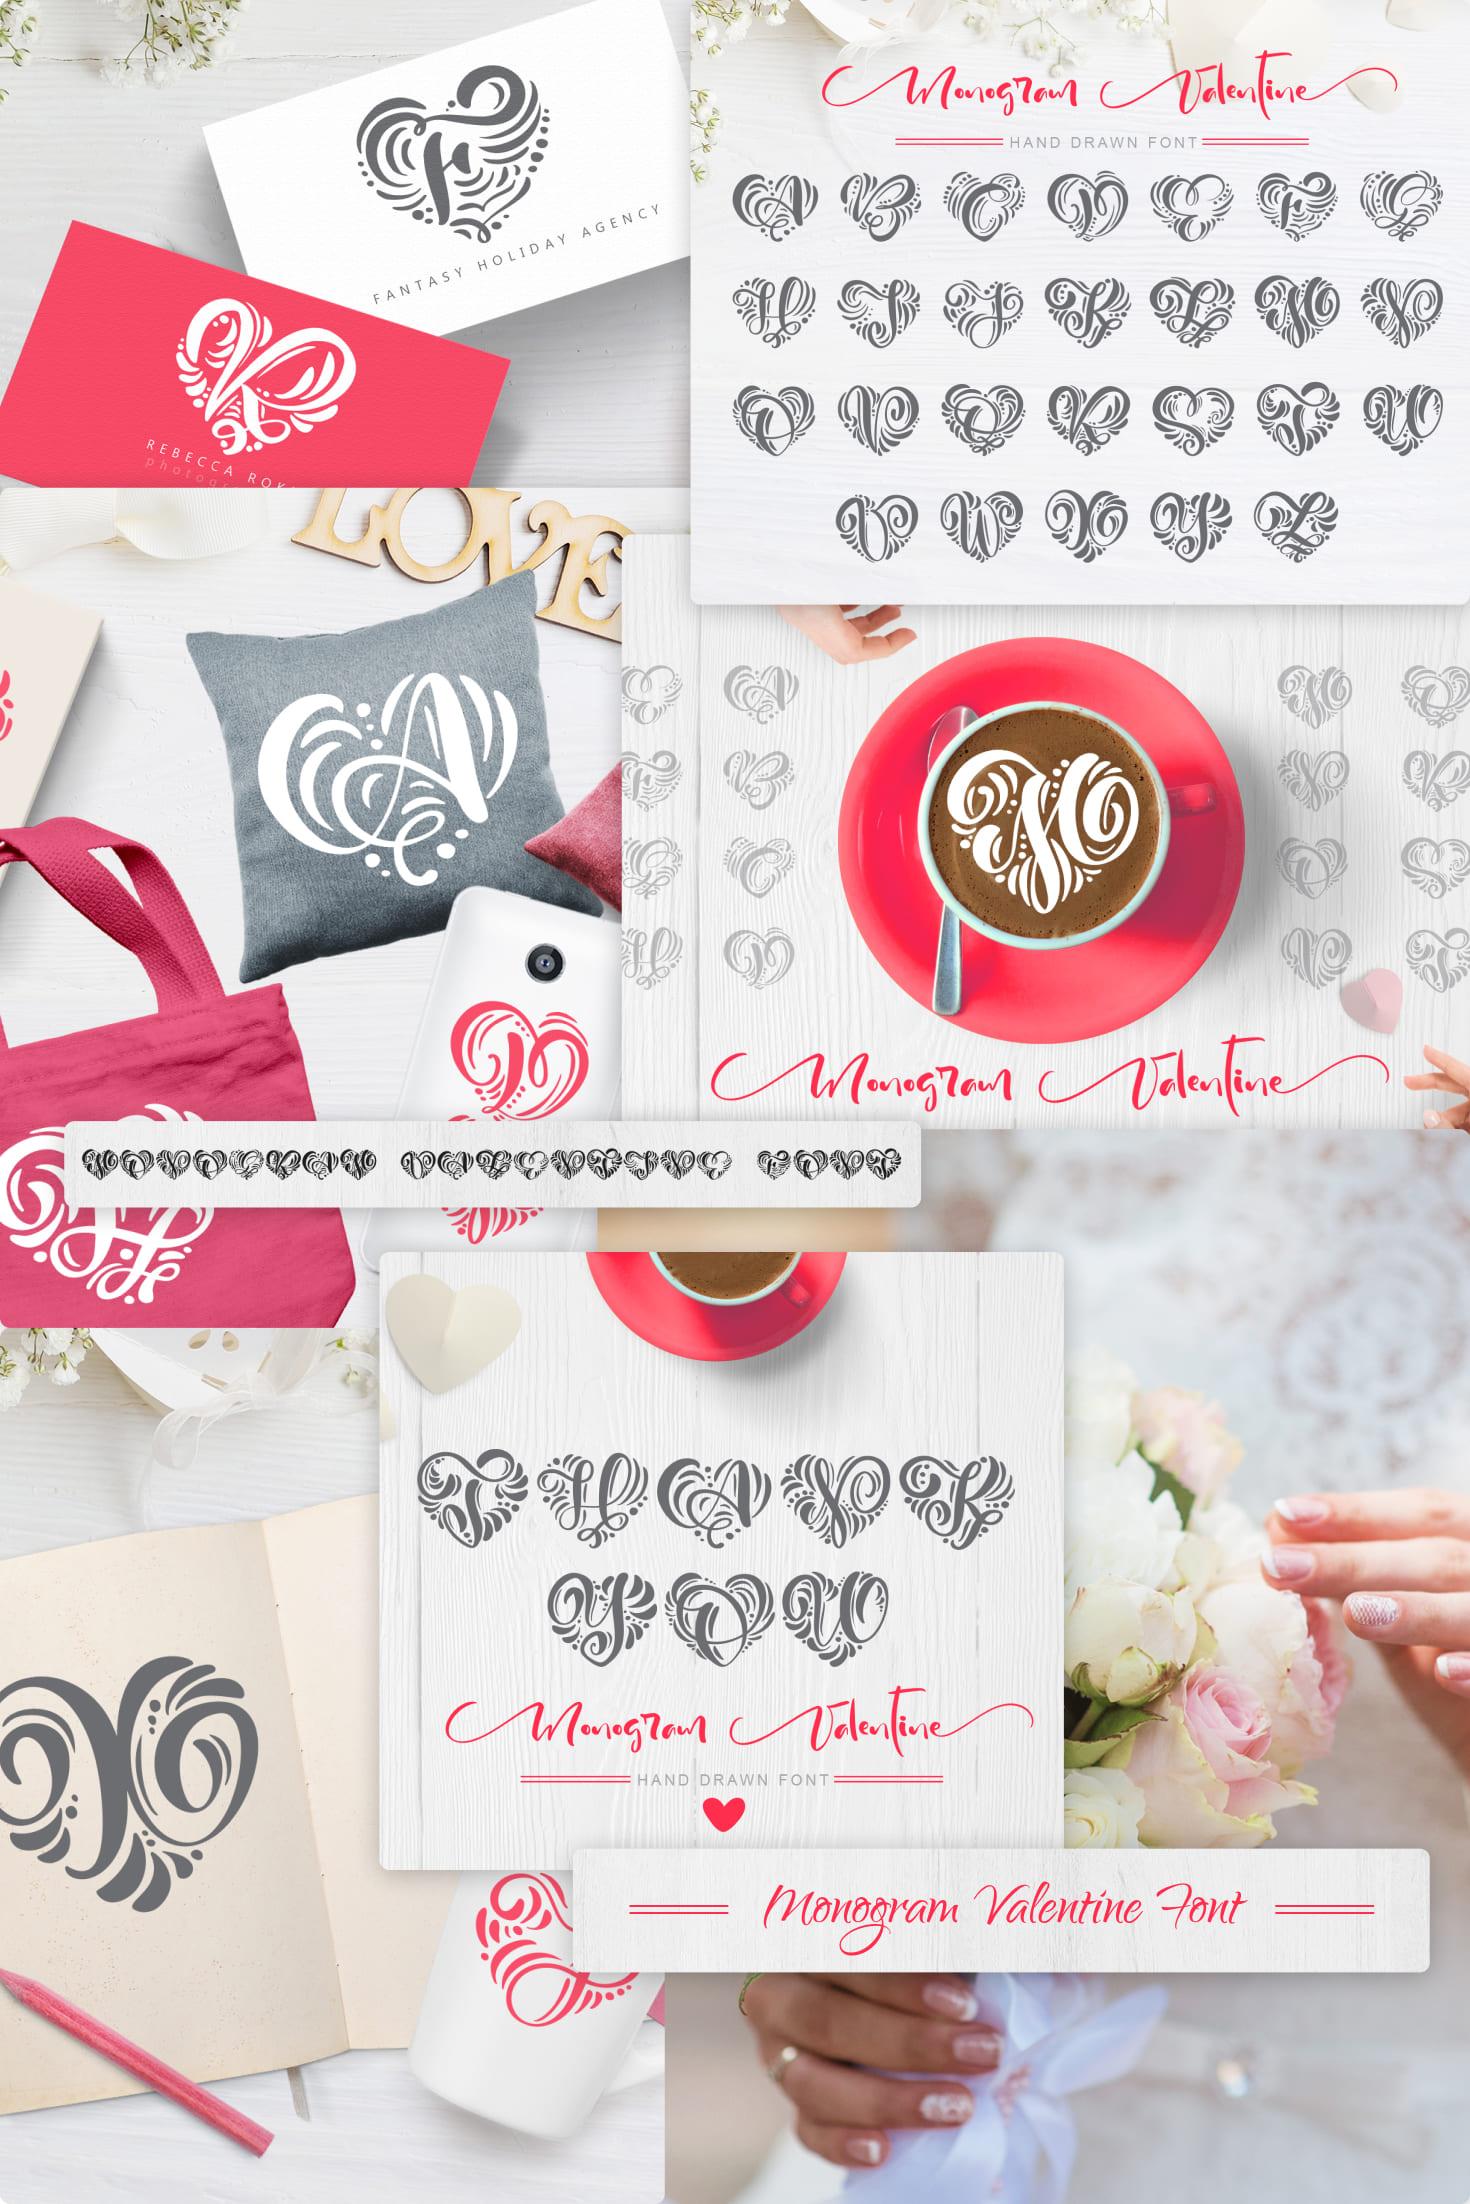 Pinterest Image: Monogram Valentine Font.